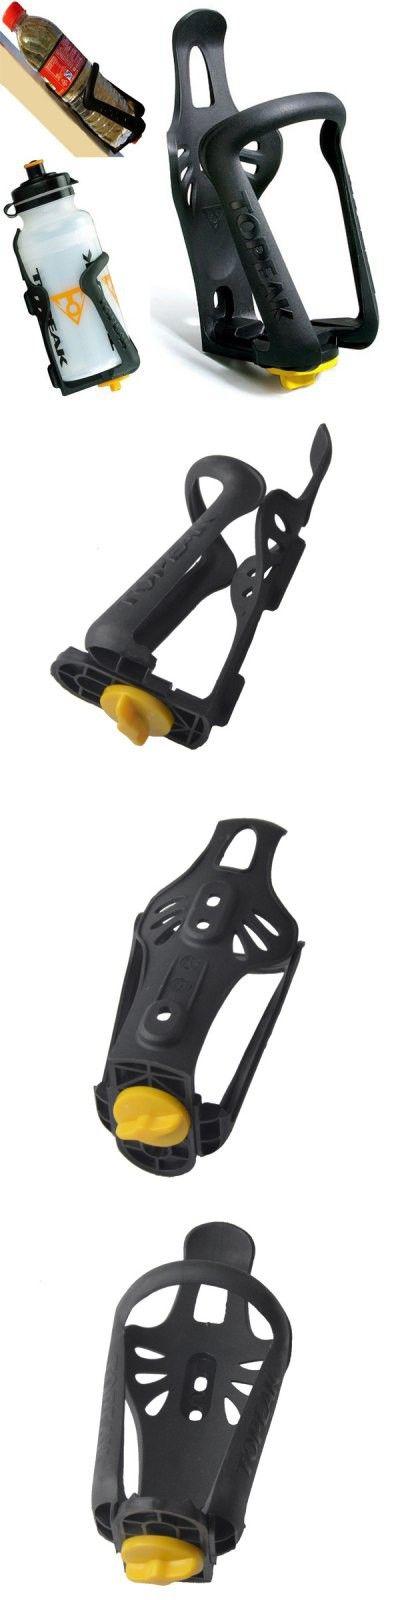 Bike Holder | Universal Bicycle Adjustable Kettle Water Bottle Cage Holder Shelf Track Bike Cycling MTB Necessaries